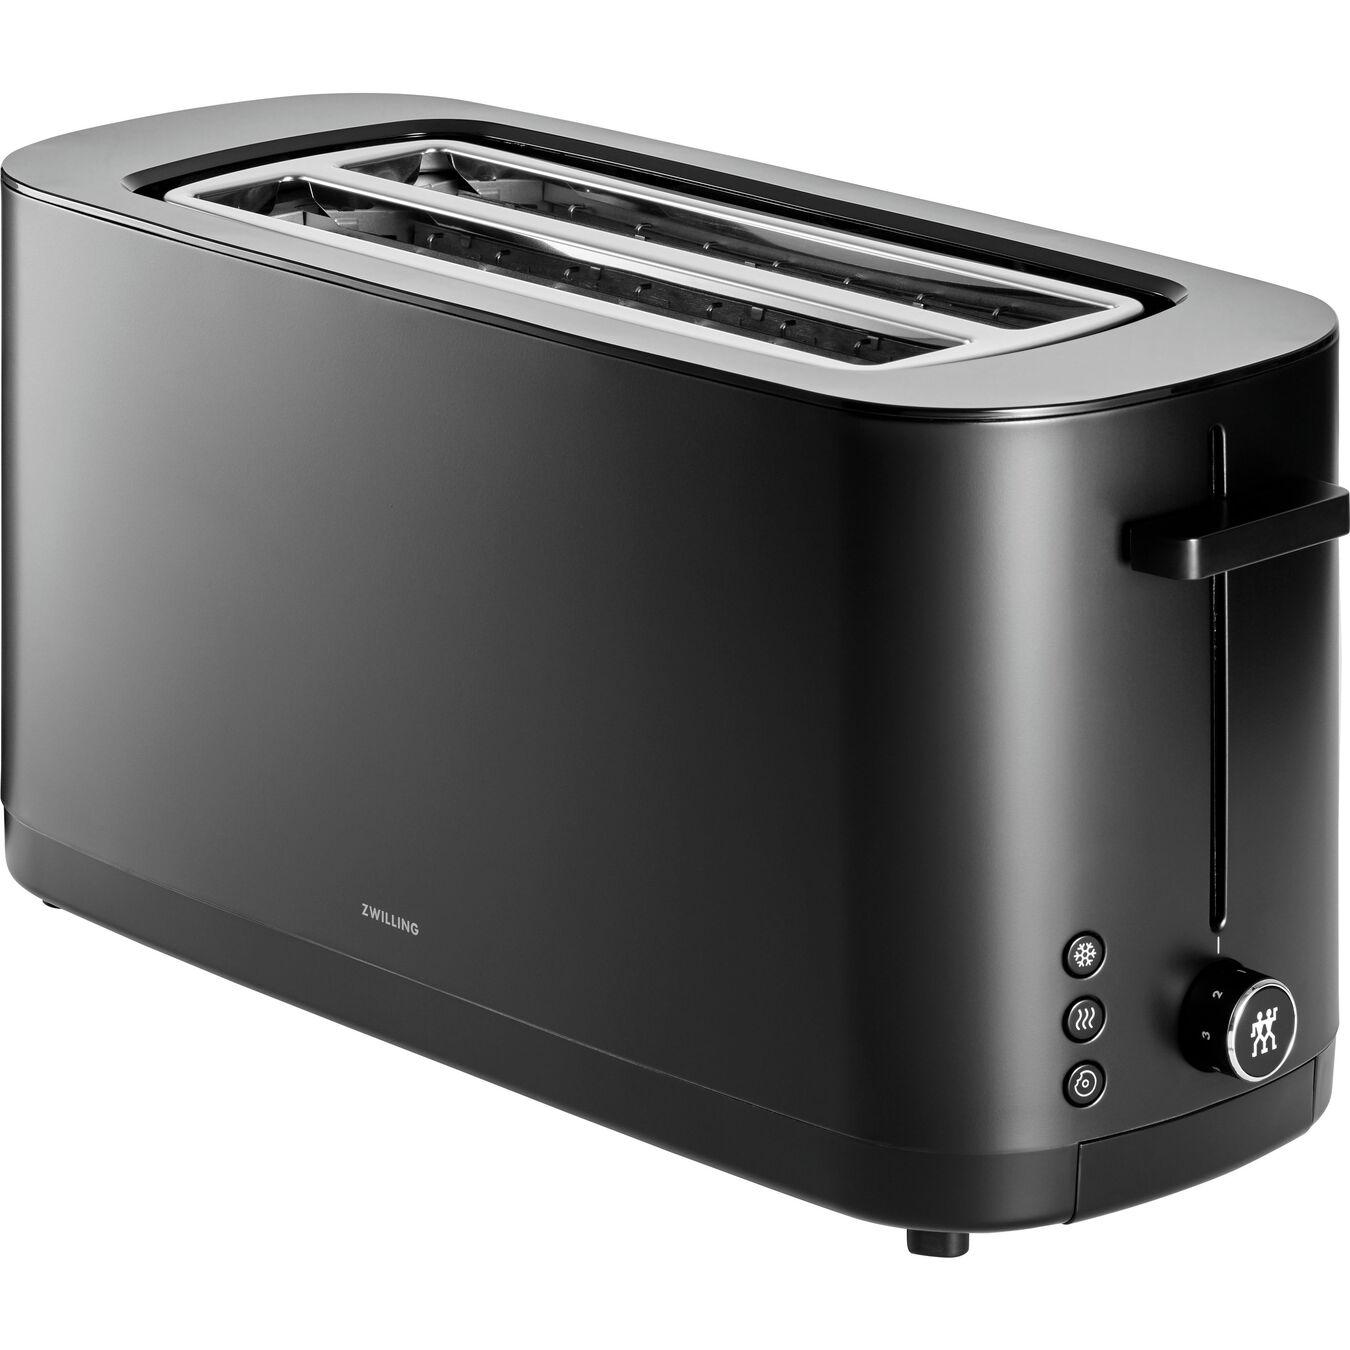 2 Long Slot Toaster - Black,,large 1